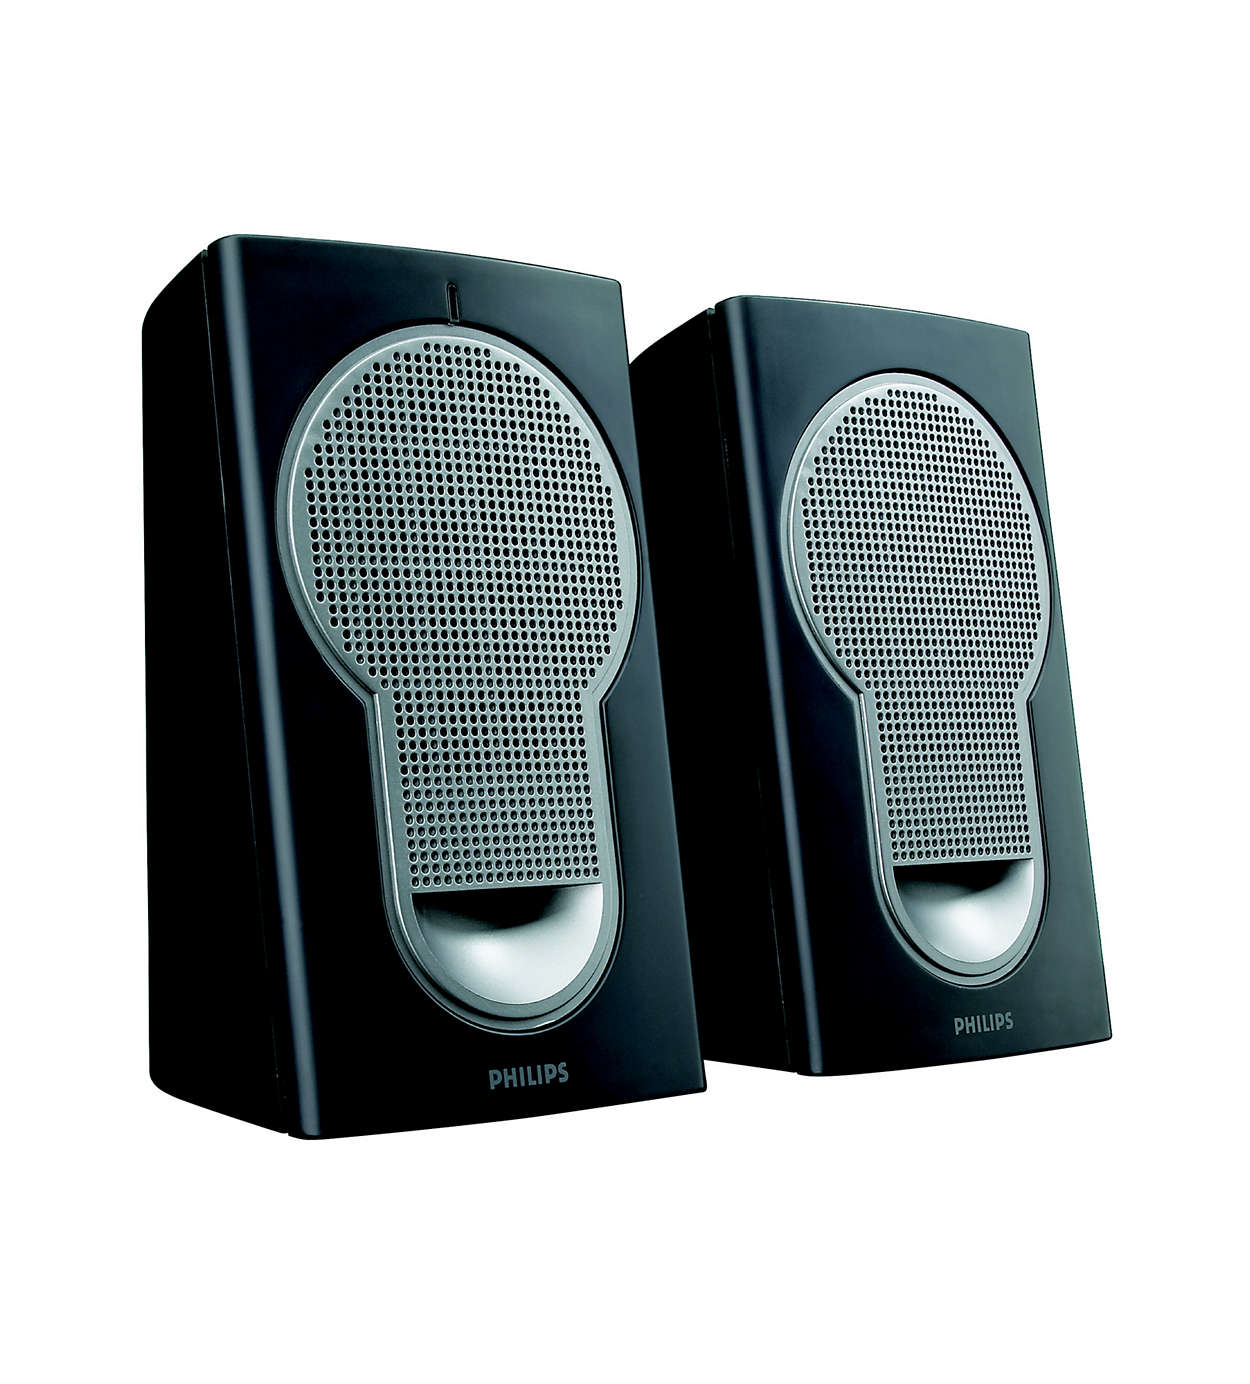 Toller Klang aus kompakten Lautsprechern